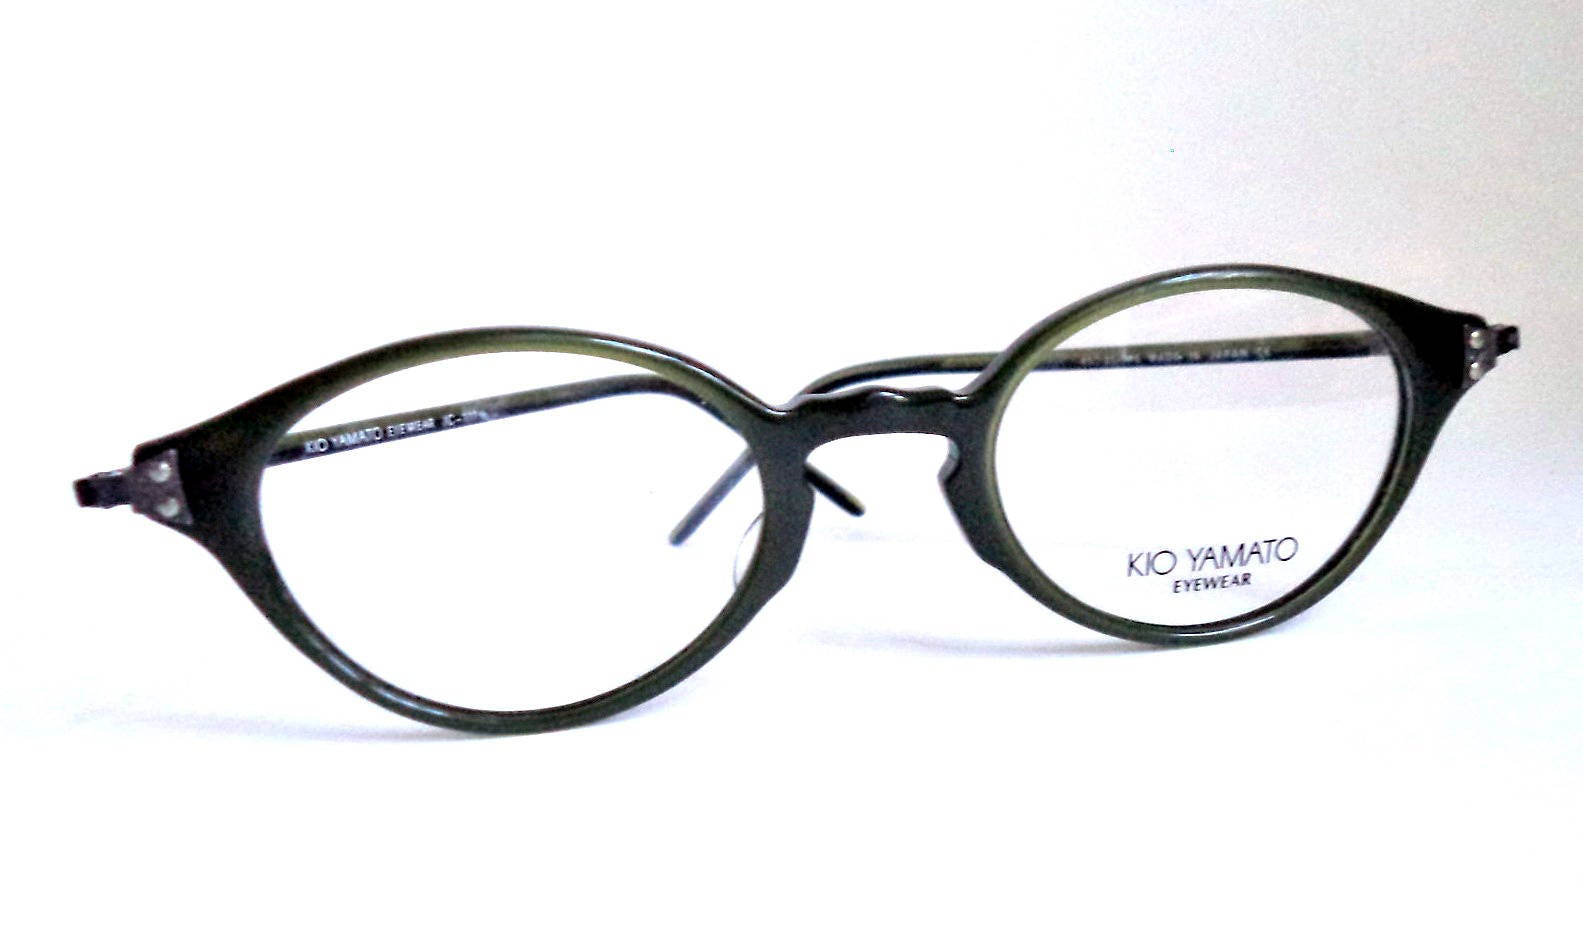 Kio Yamato Japan Cateye NOS Eyeglasses Green Horn Rim Antique